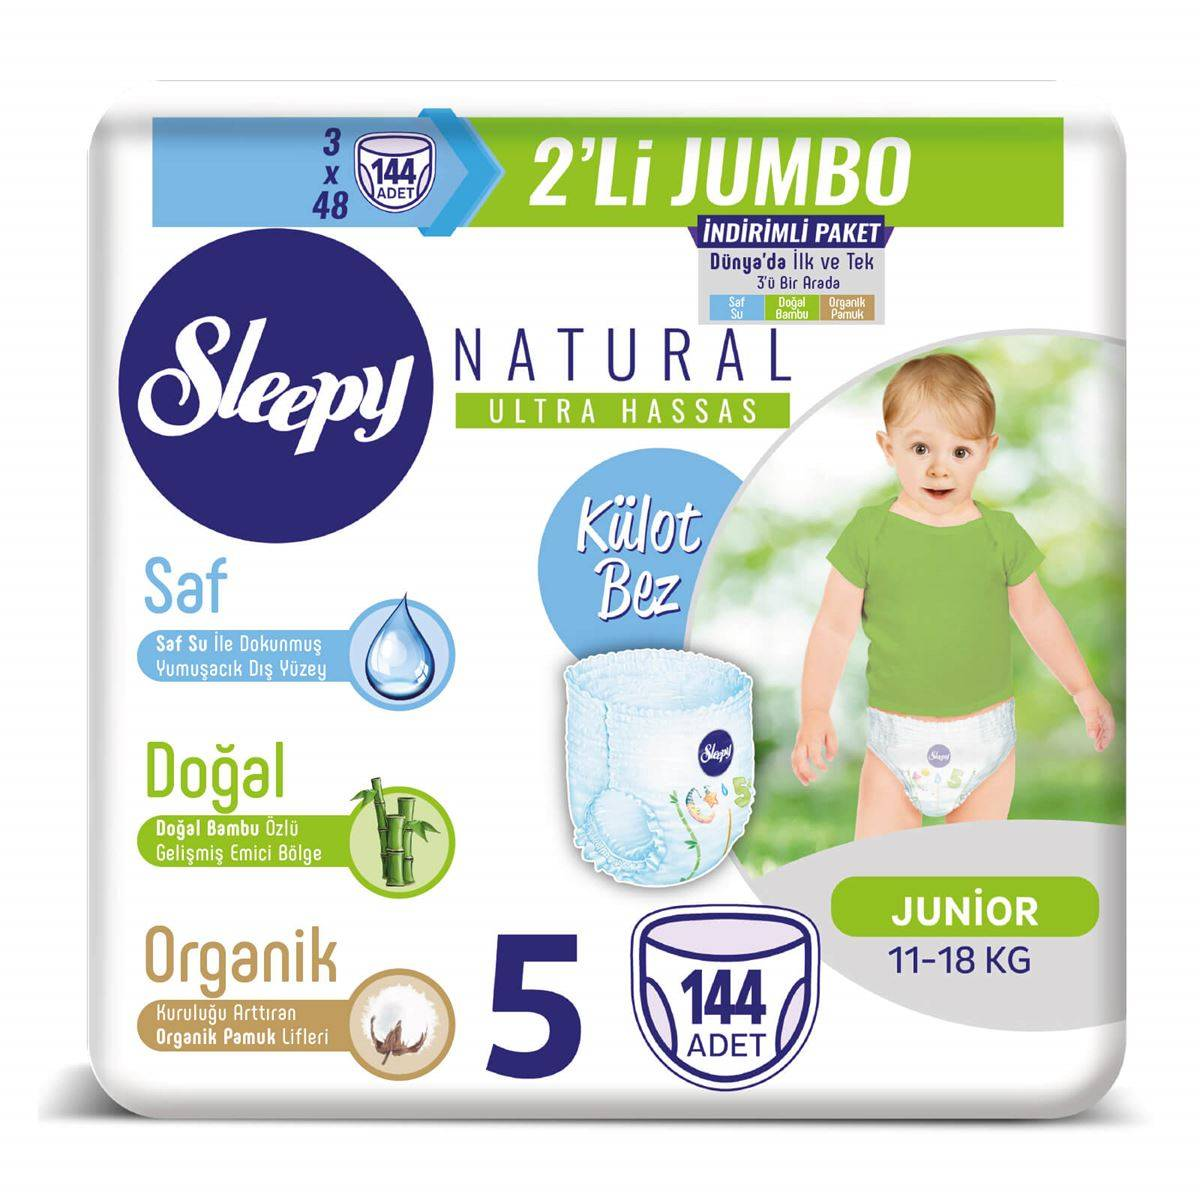 Sleepy Natural Külot Bez 5 Numara Junior 3X2'Lİ JUMBO